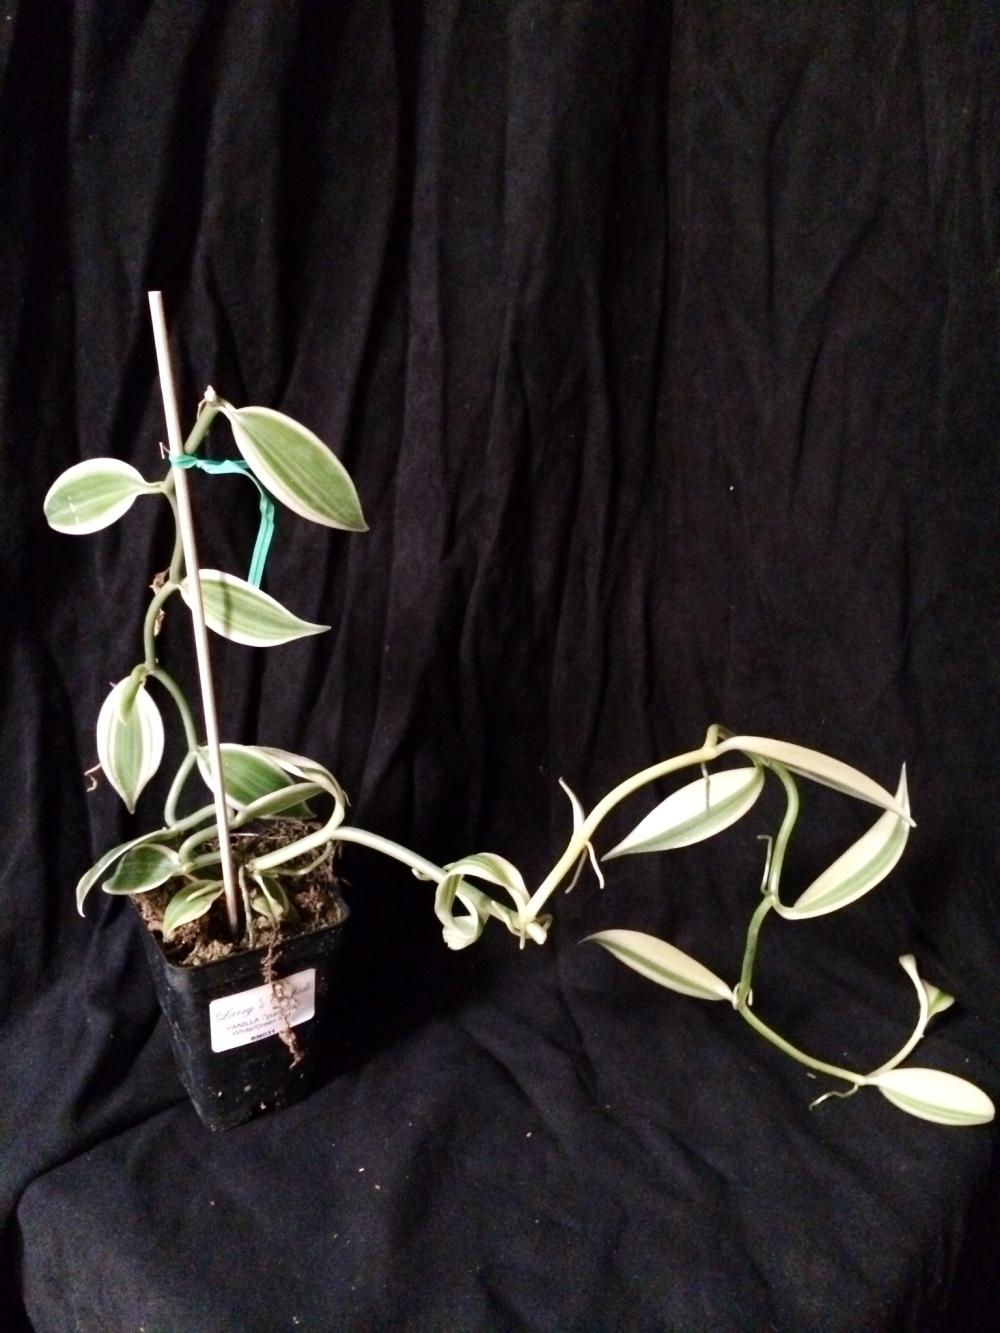 Vanilla planifolia